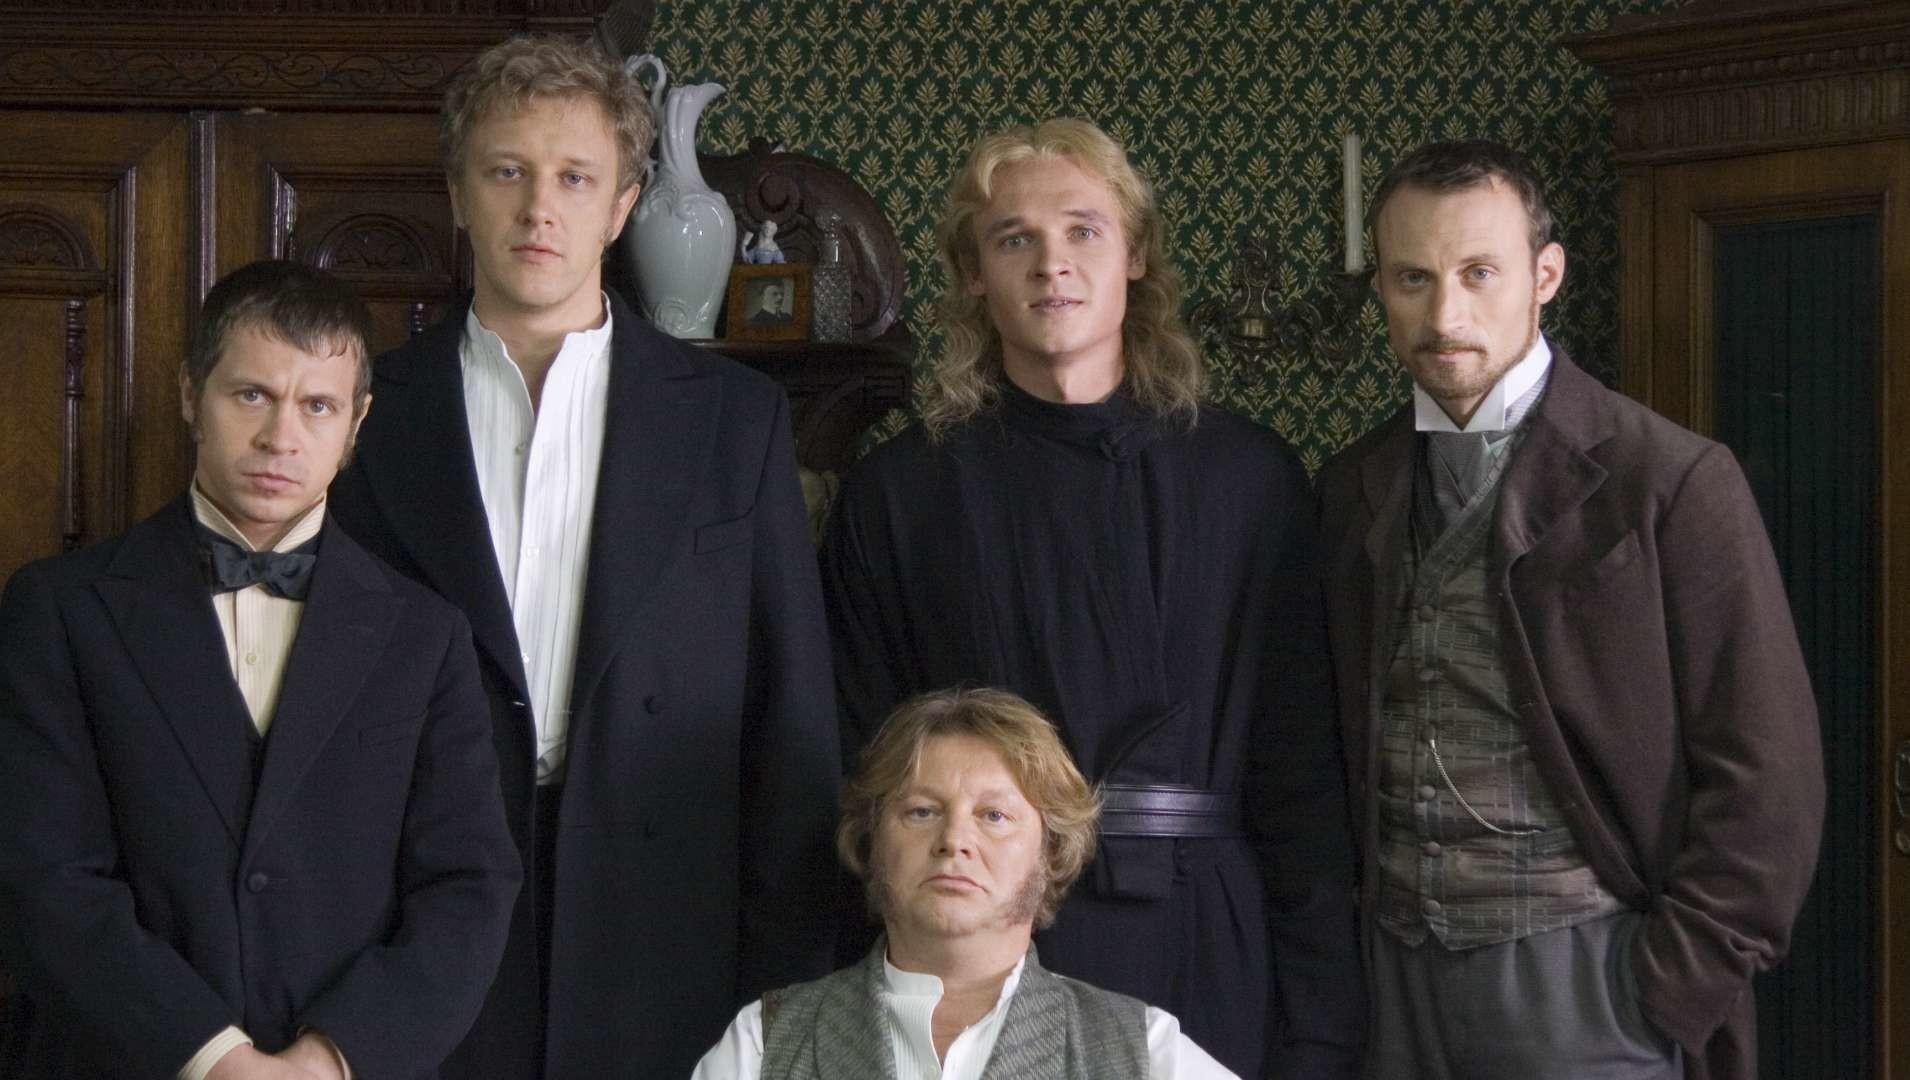 "Foto di scena del seriale del 2008 ""I fratelli Karamazov"" del regista Jurij Moroz"